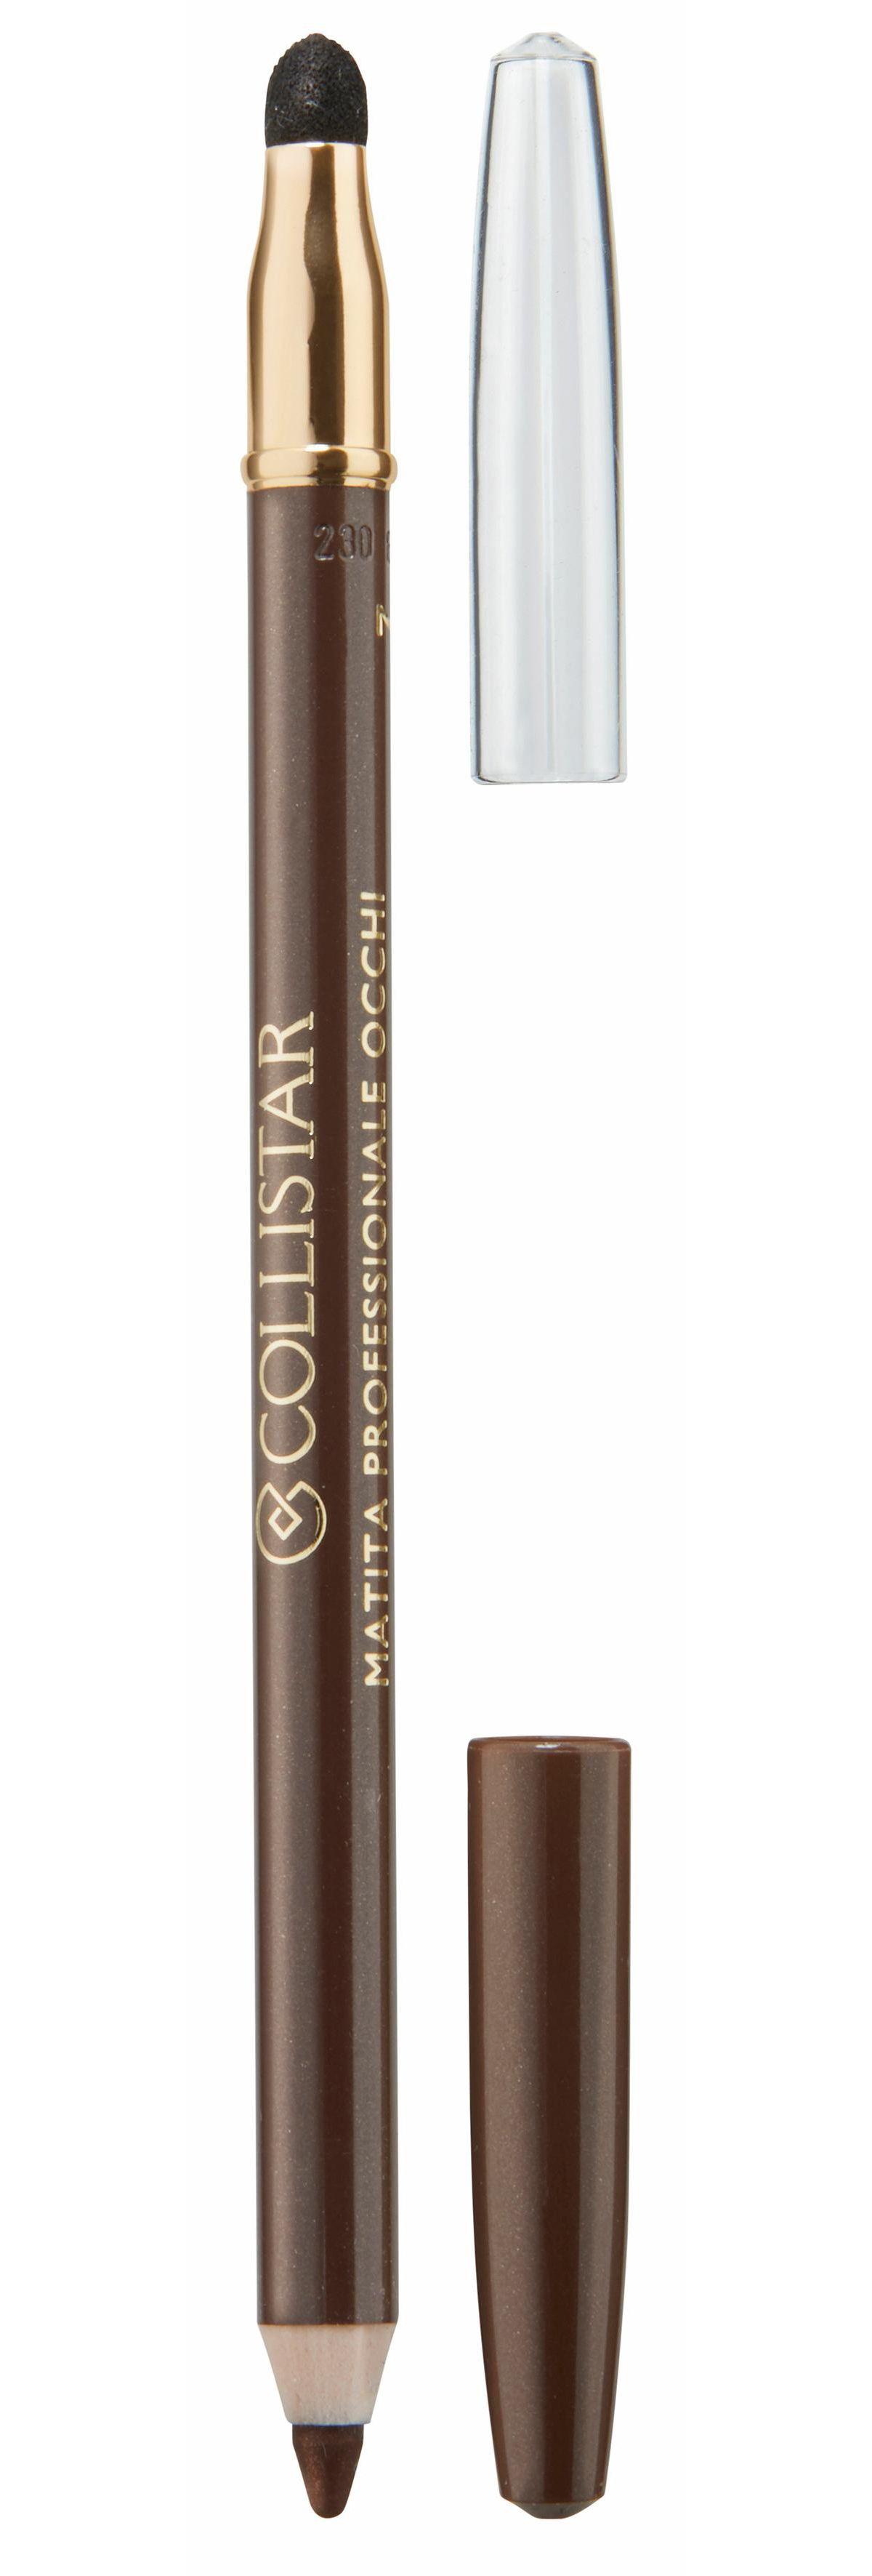 Collistar, »Professional Eye Pencil«, Kajalstift